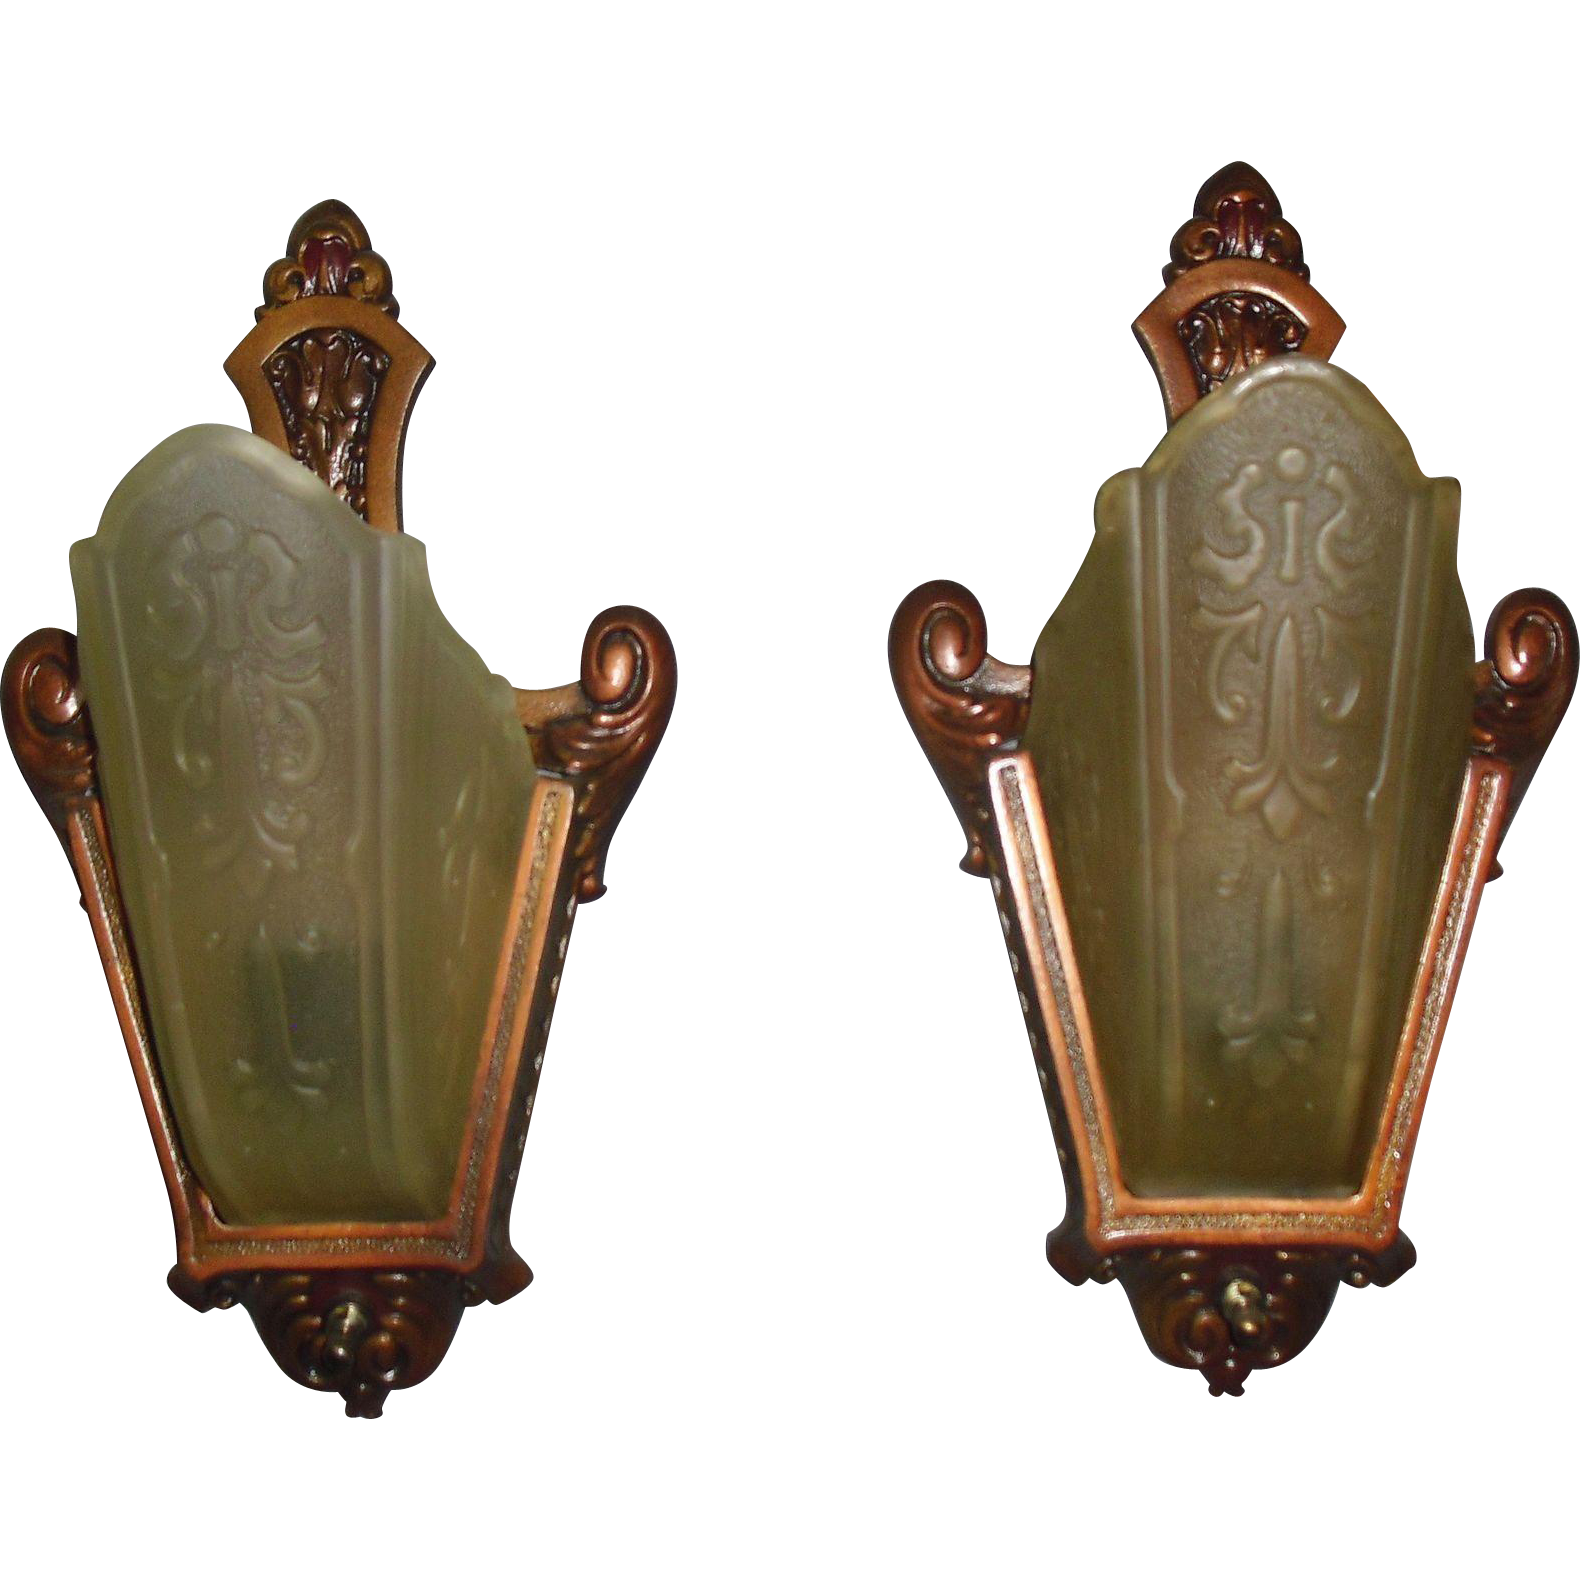 Art Deco Slip Shade Wall Sconces - Moe Bridges - 2 pairs available